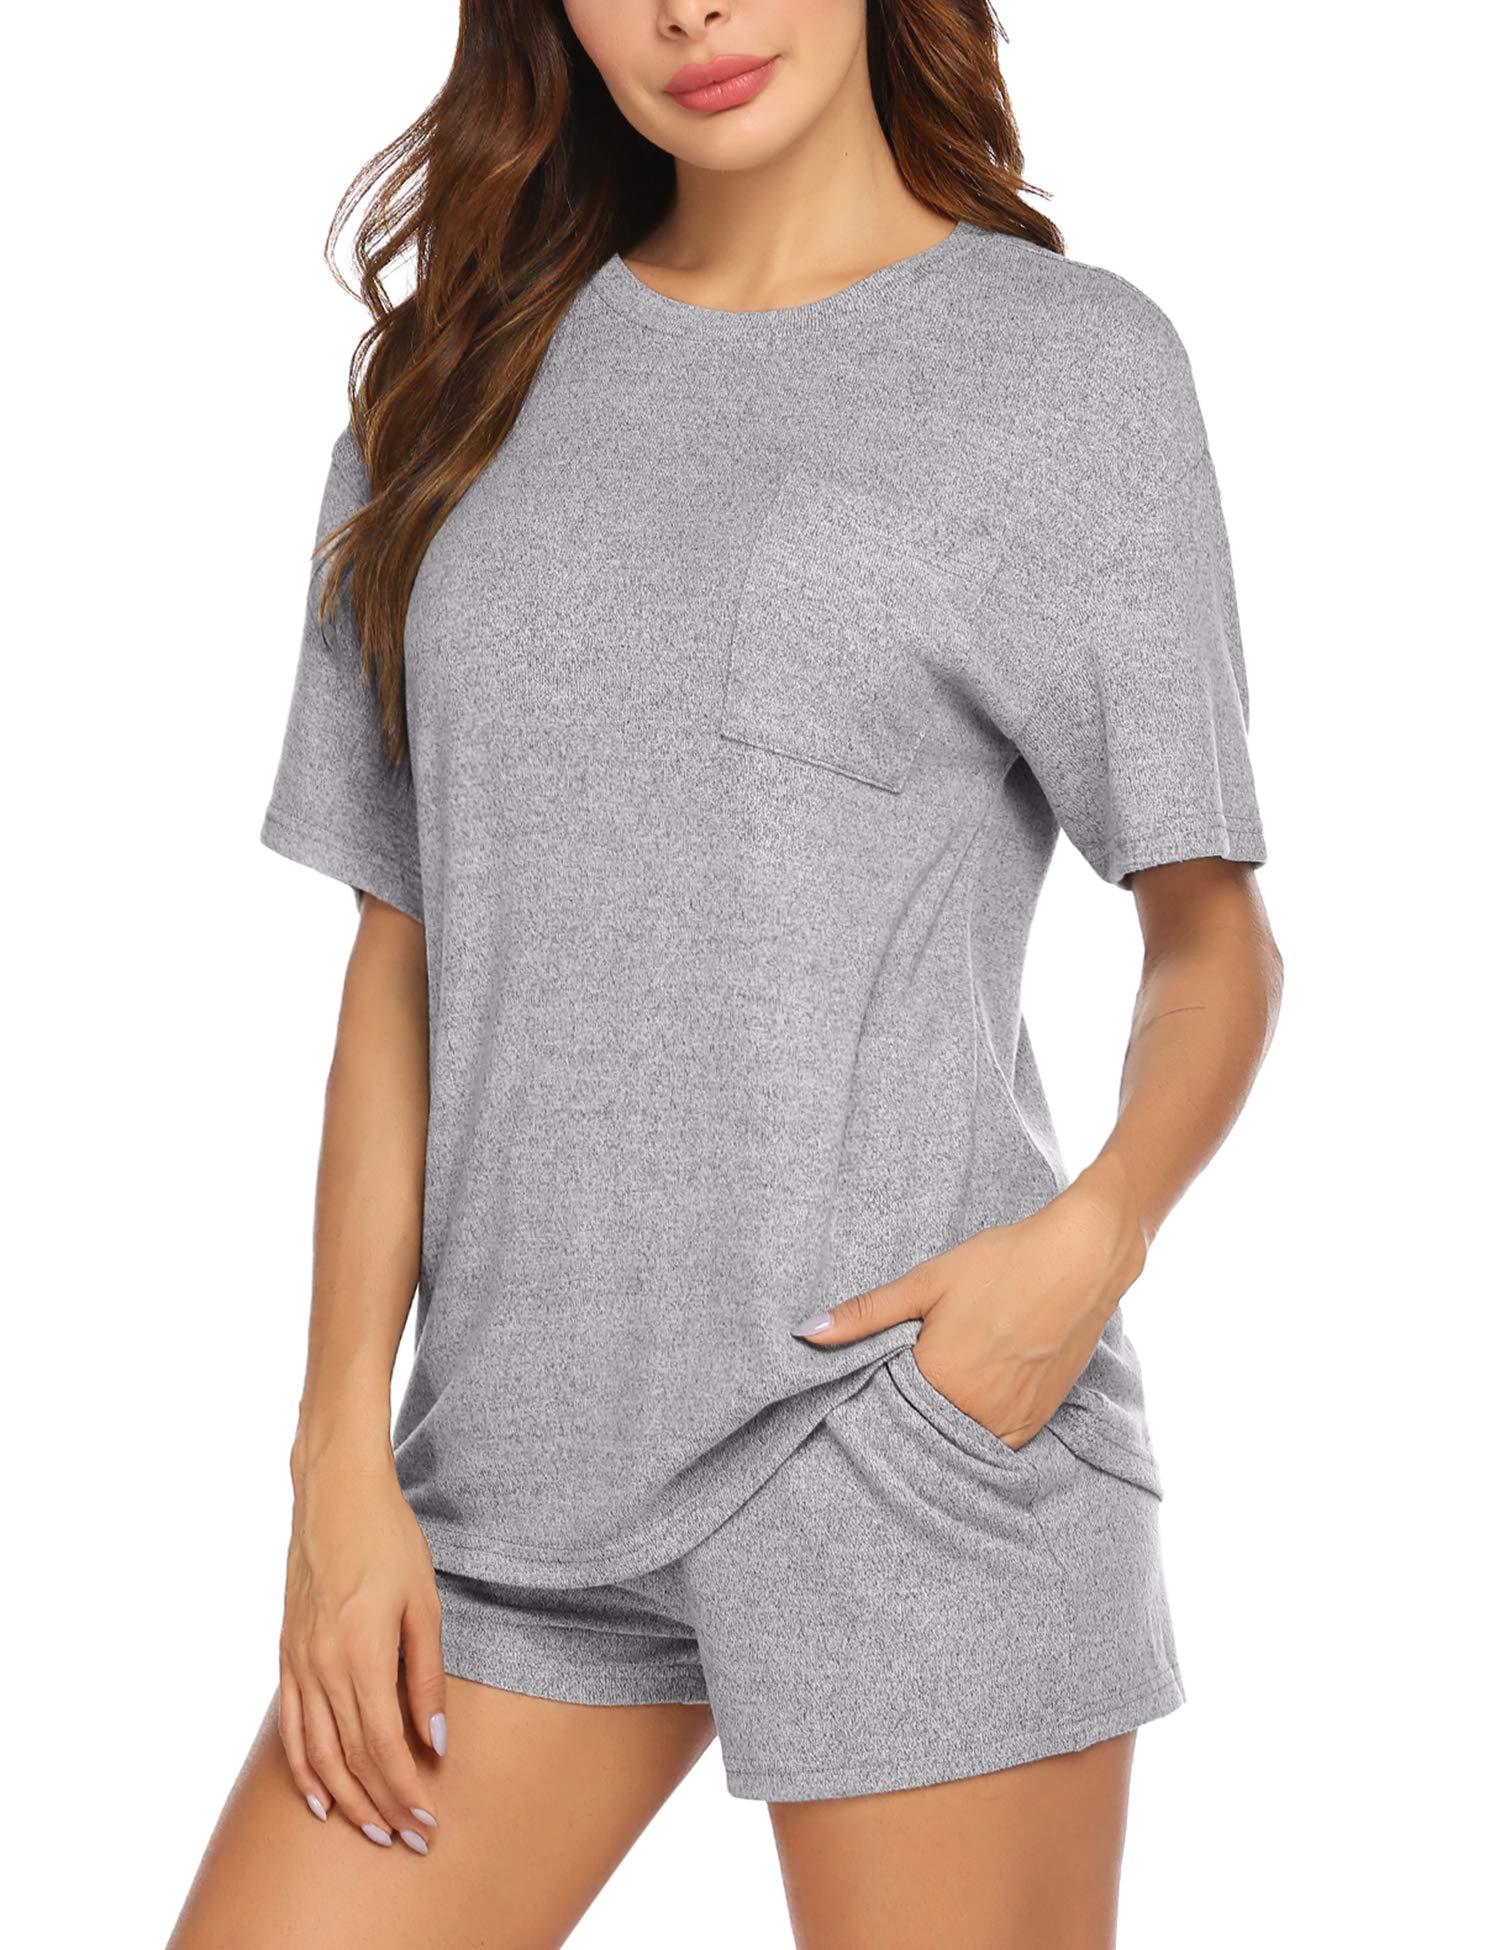 Beyove Pajamas Set, Women's Short Sleeve Pocket Sleepwear Nightwear Pjs (S-XXL)